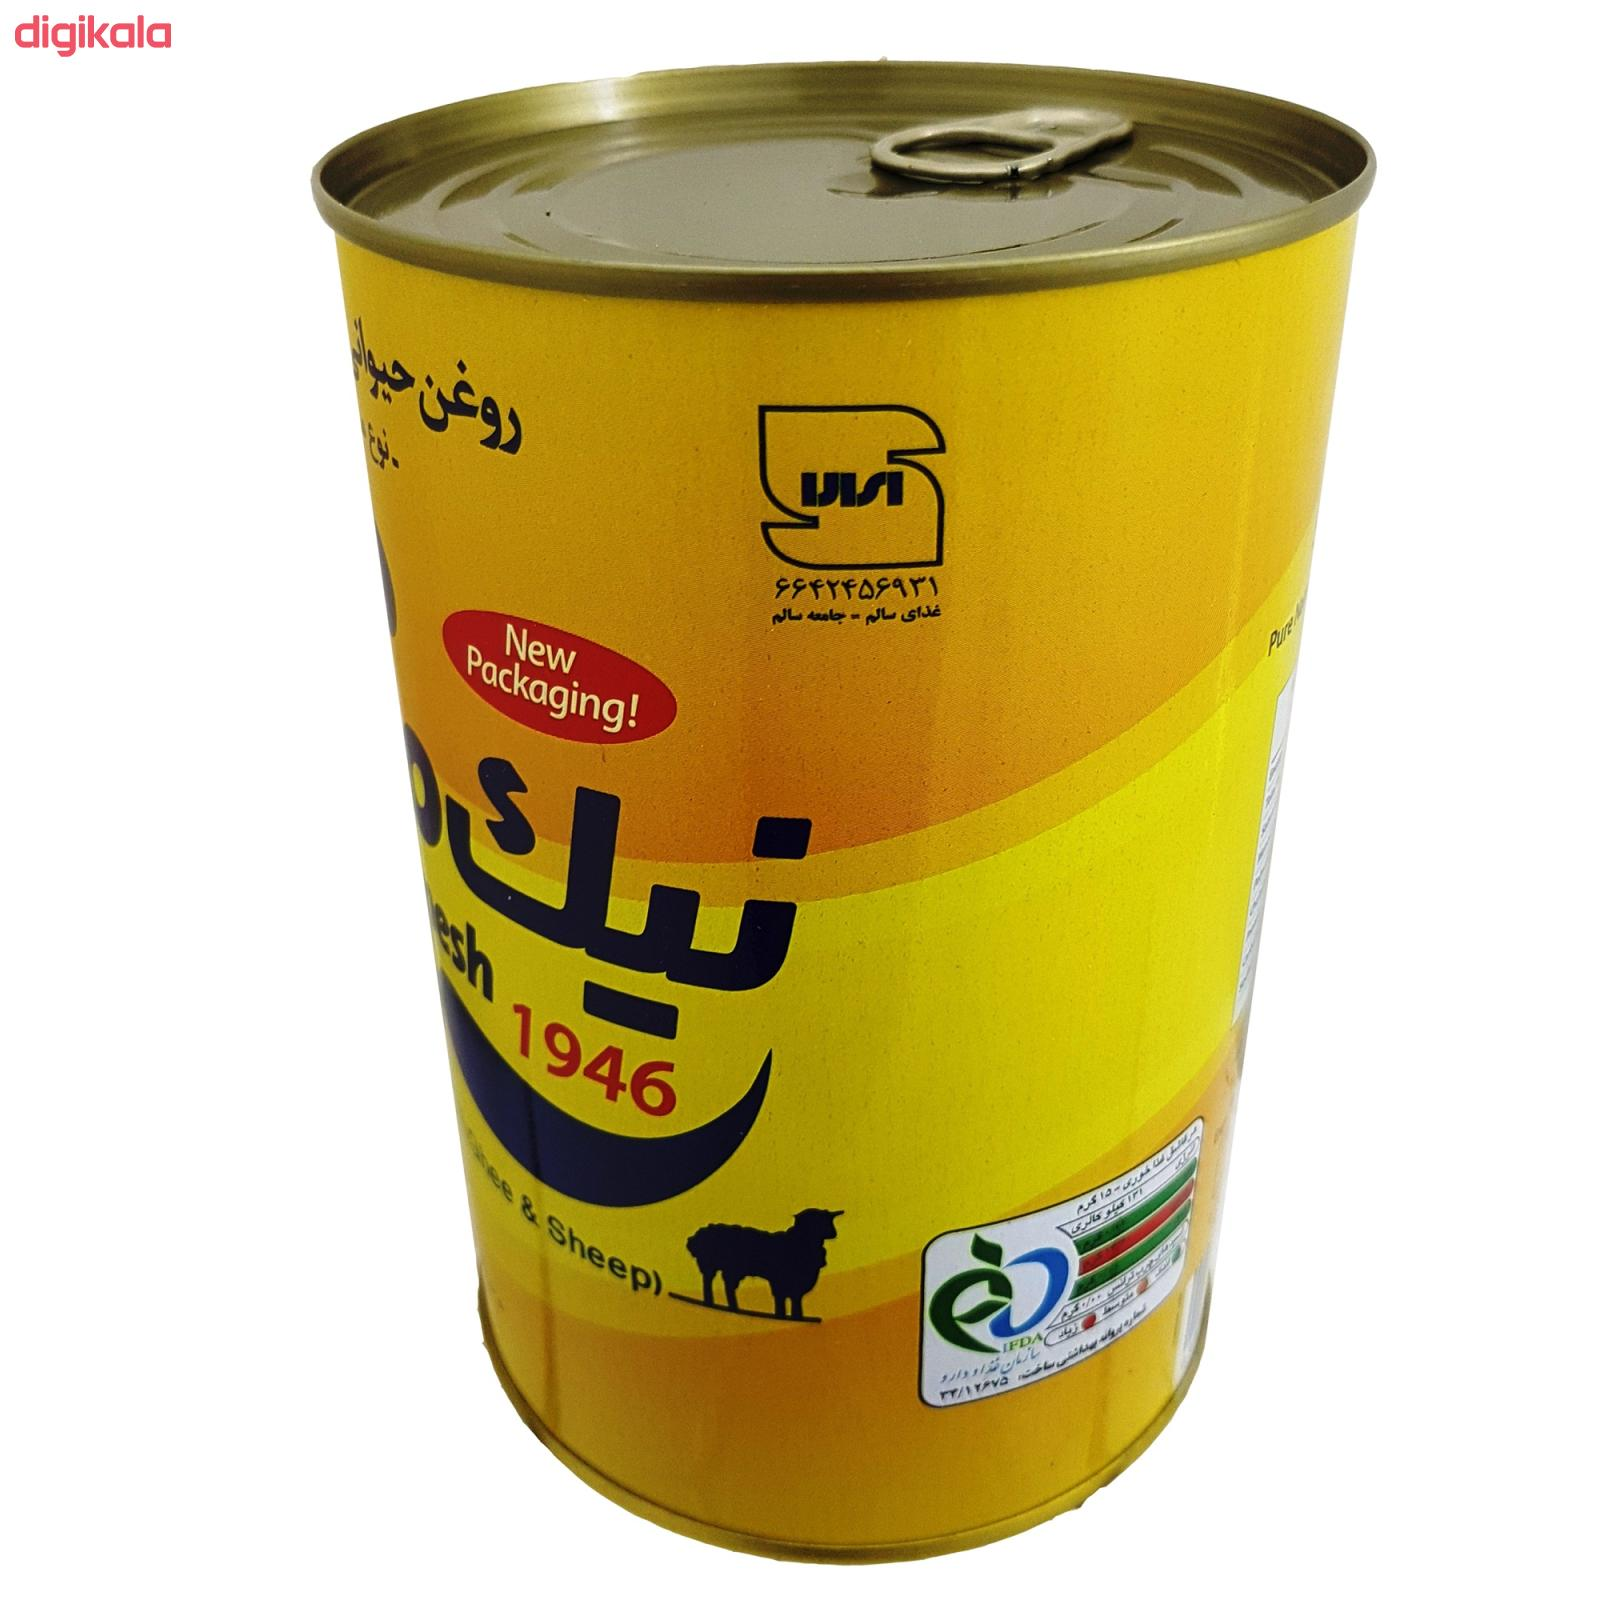 روغن حیوانی کرمانشاهی ممتاز نیک منش - 900 گرم main 1 1